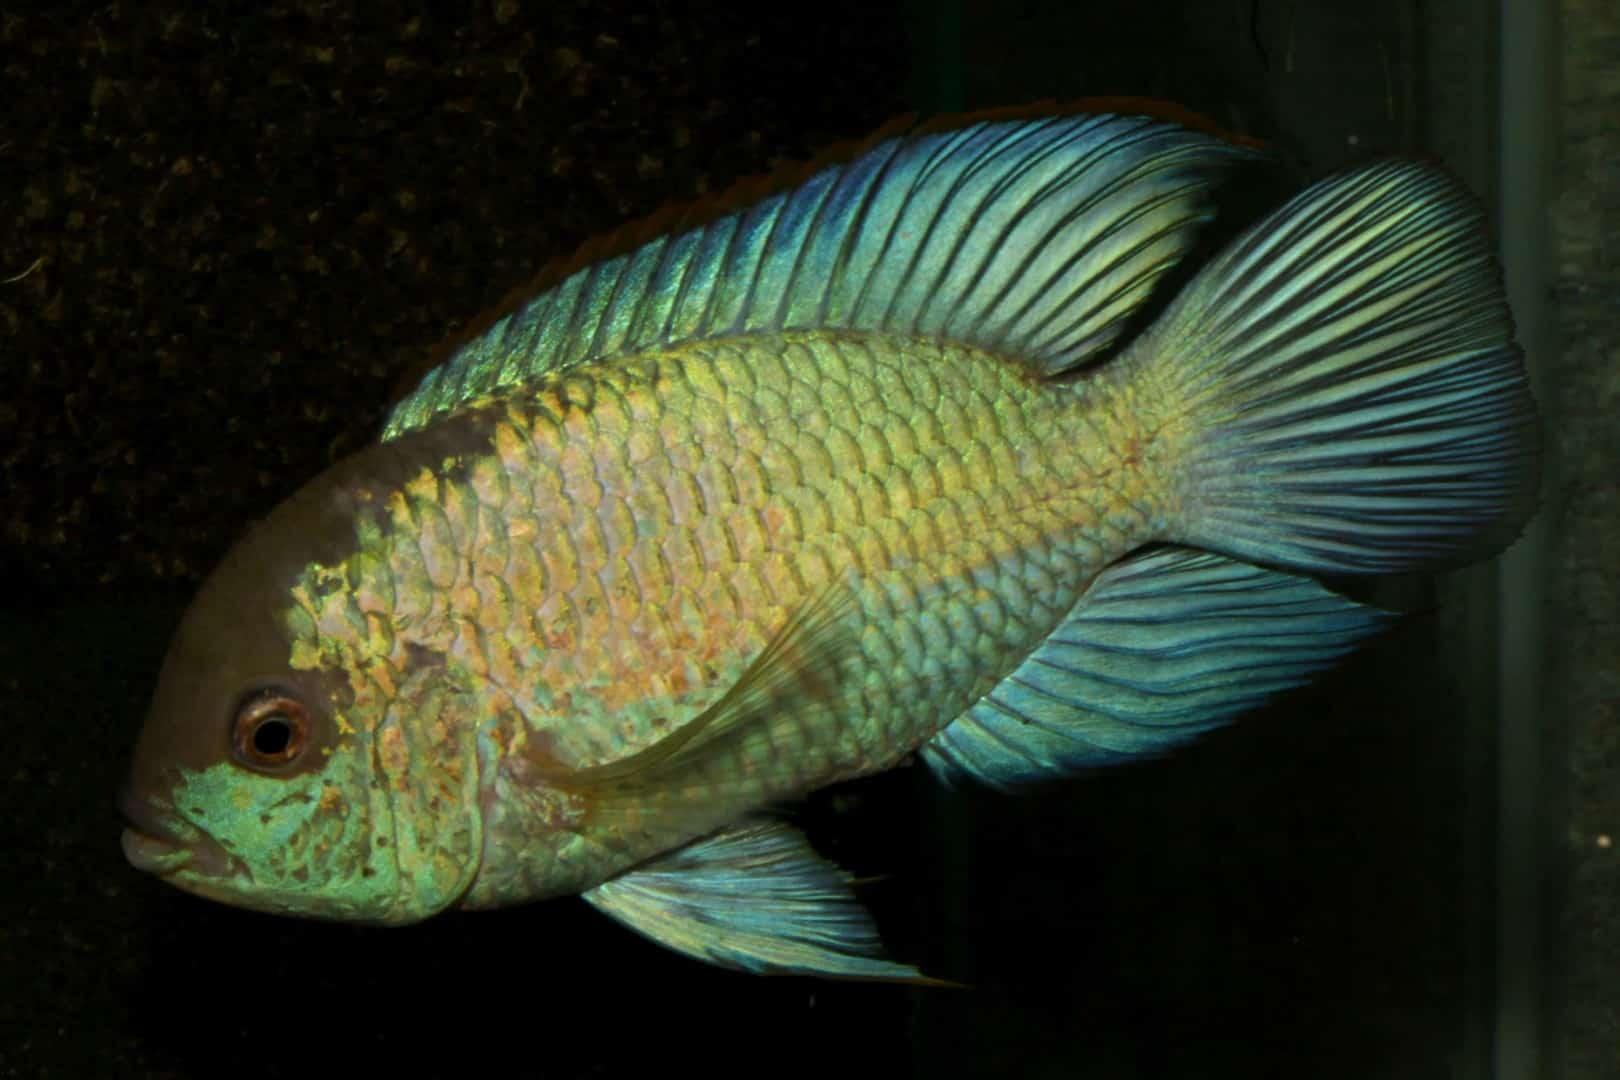 Andinoacara pulcher - Neonblauer Buntbarsch 4